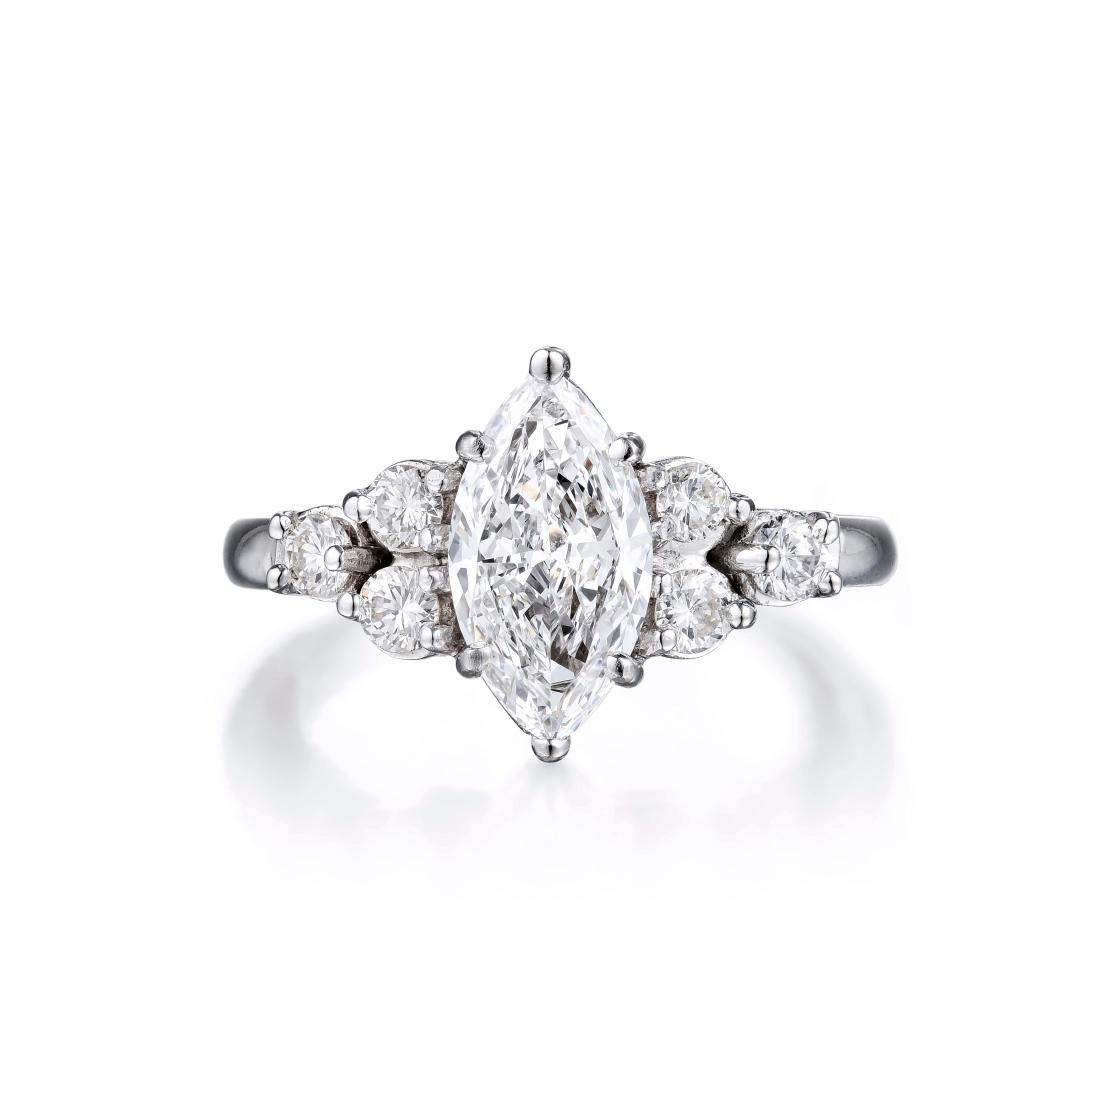 A 1.03-Carat Marquise-Cut Diamond Platinum Ring